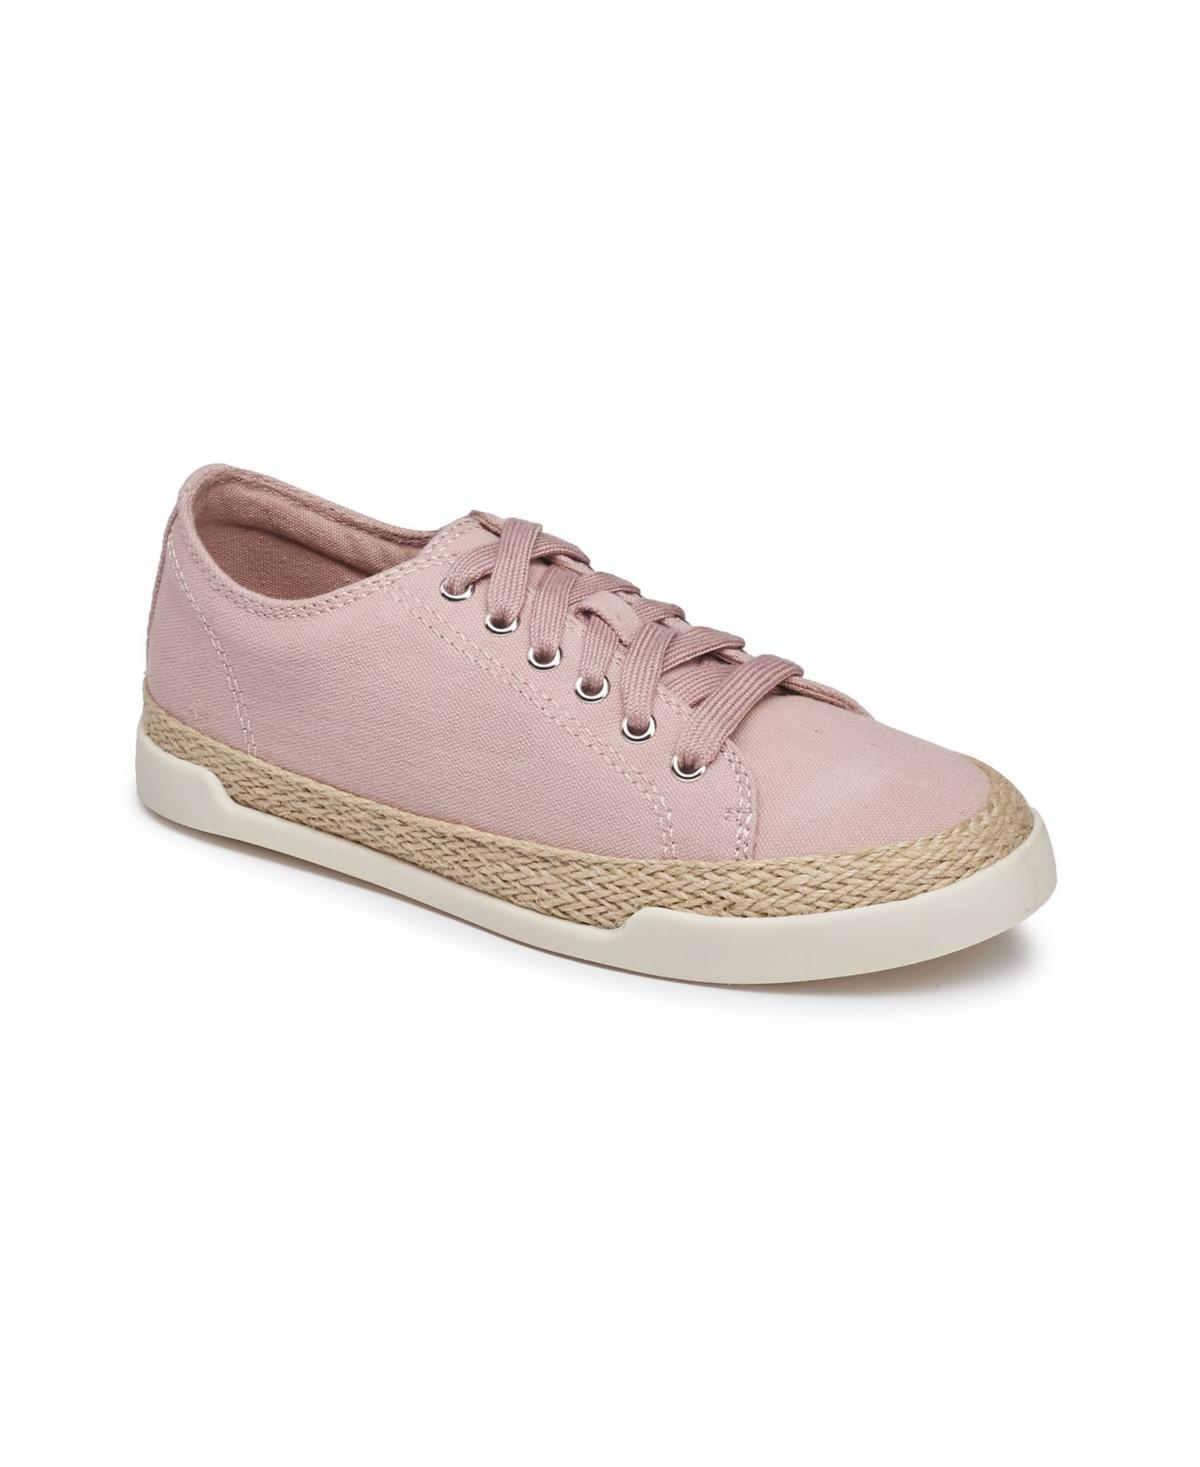 Esprit Women's Rylie Sneakers Women's Shoes